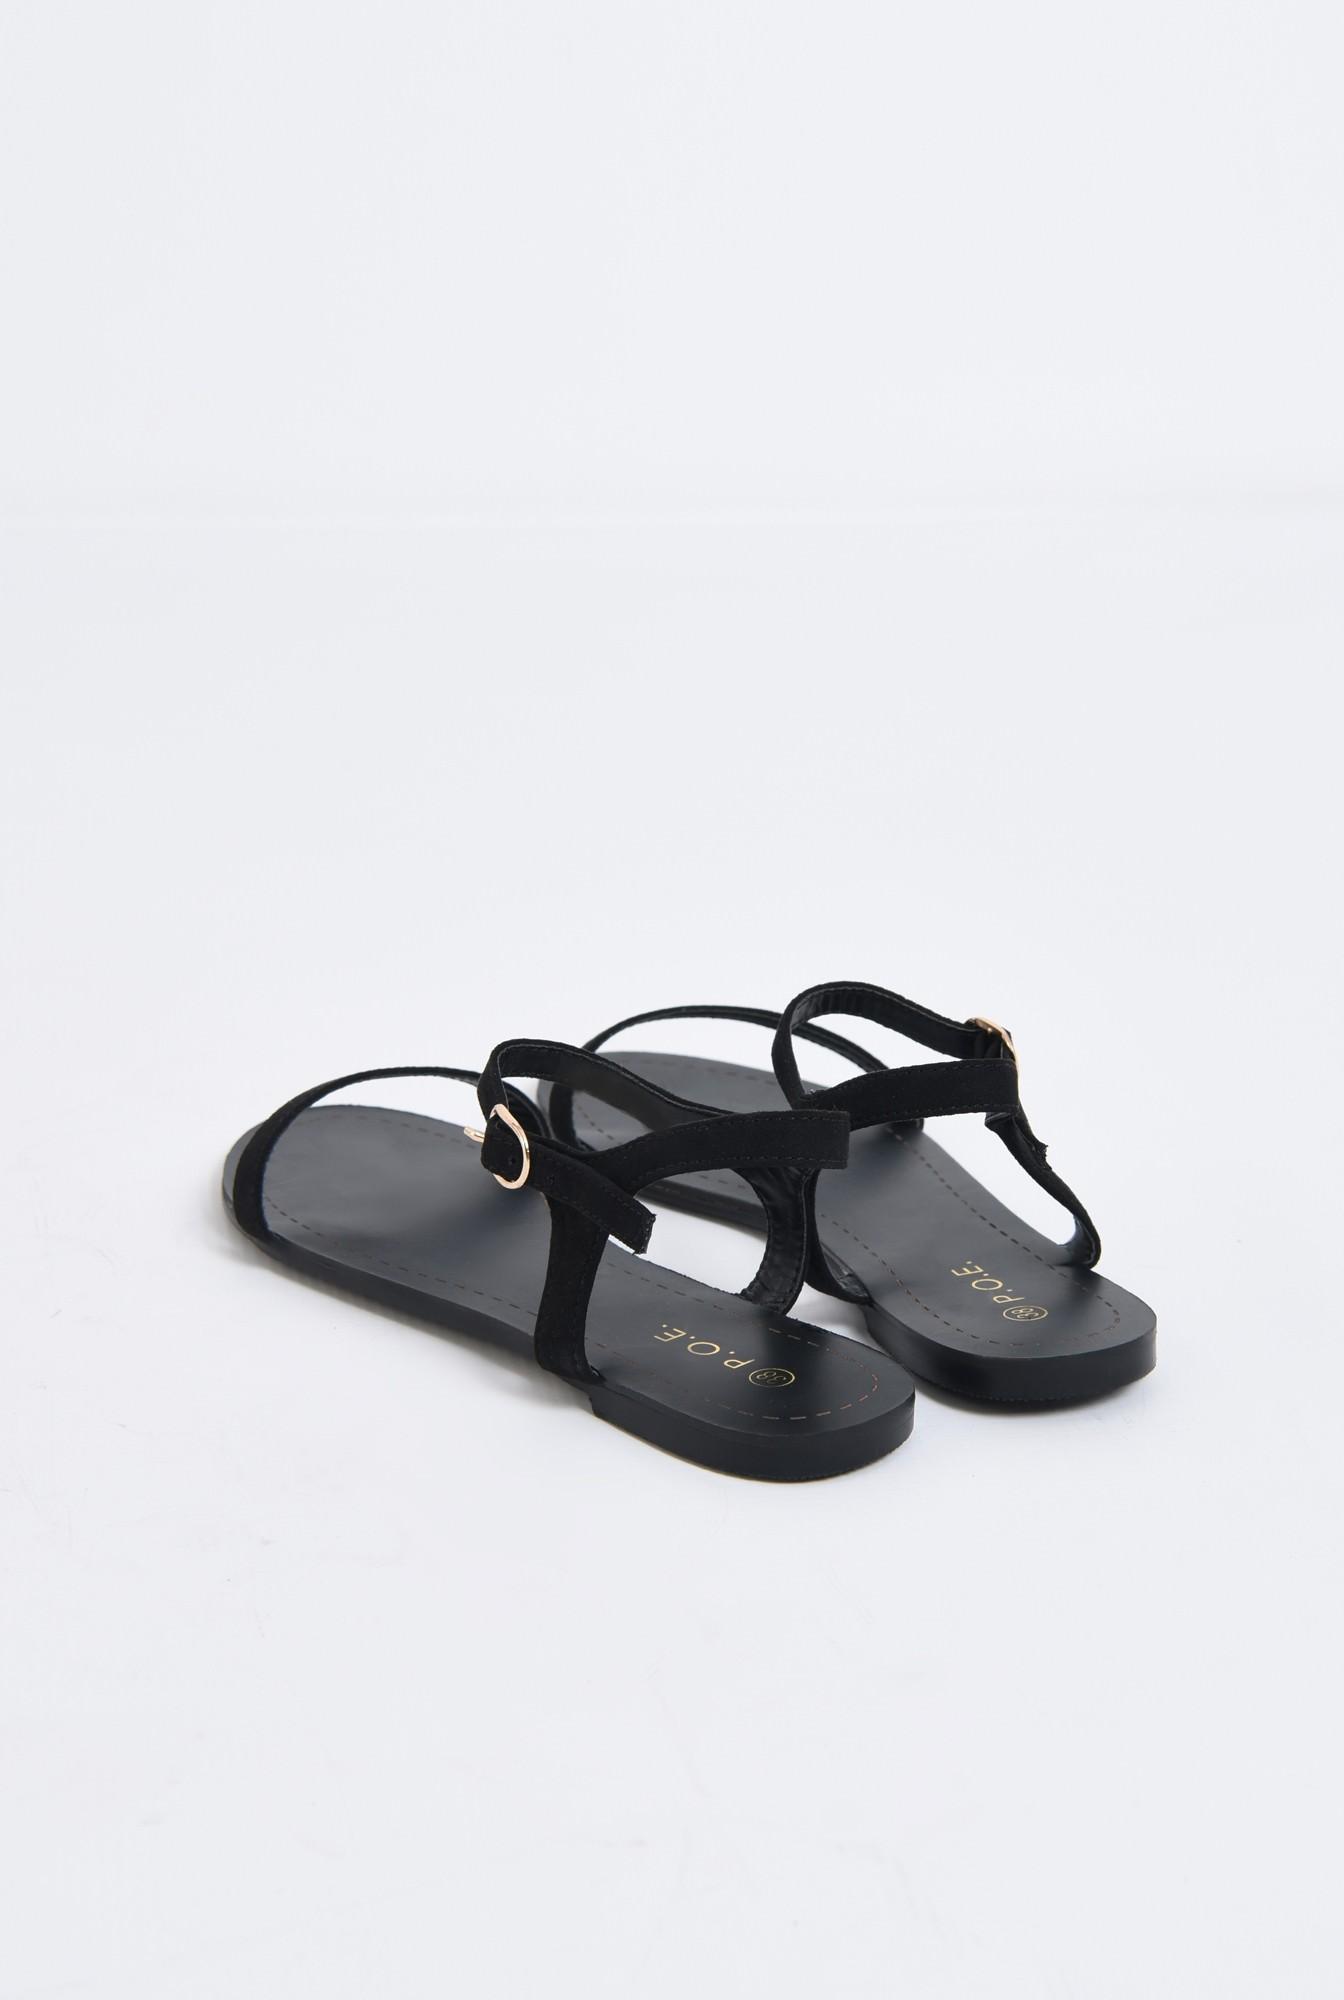 2 - sandale casual, negre, din velur, fara toc